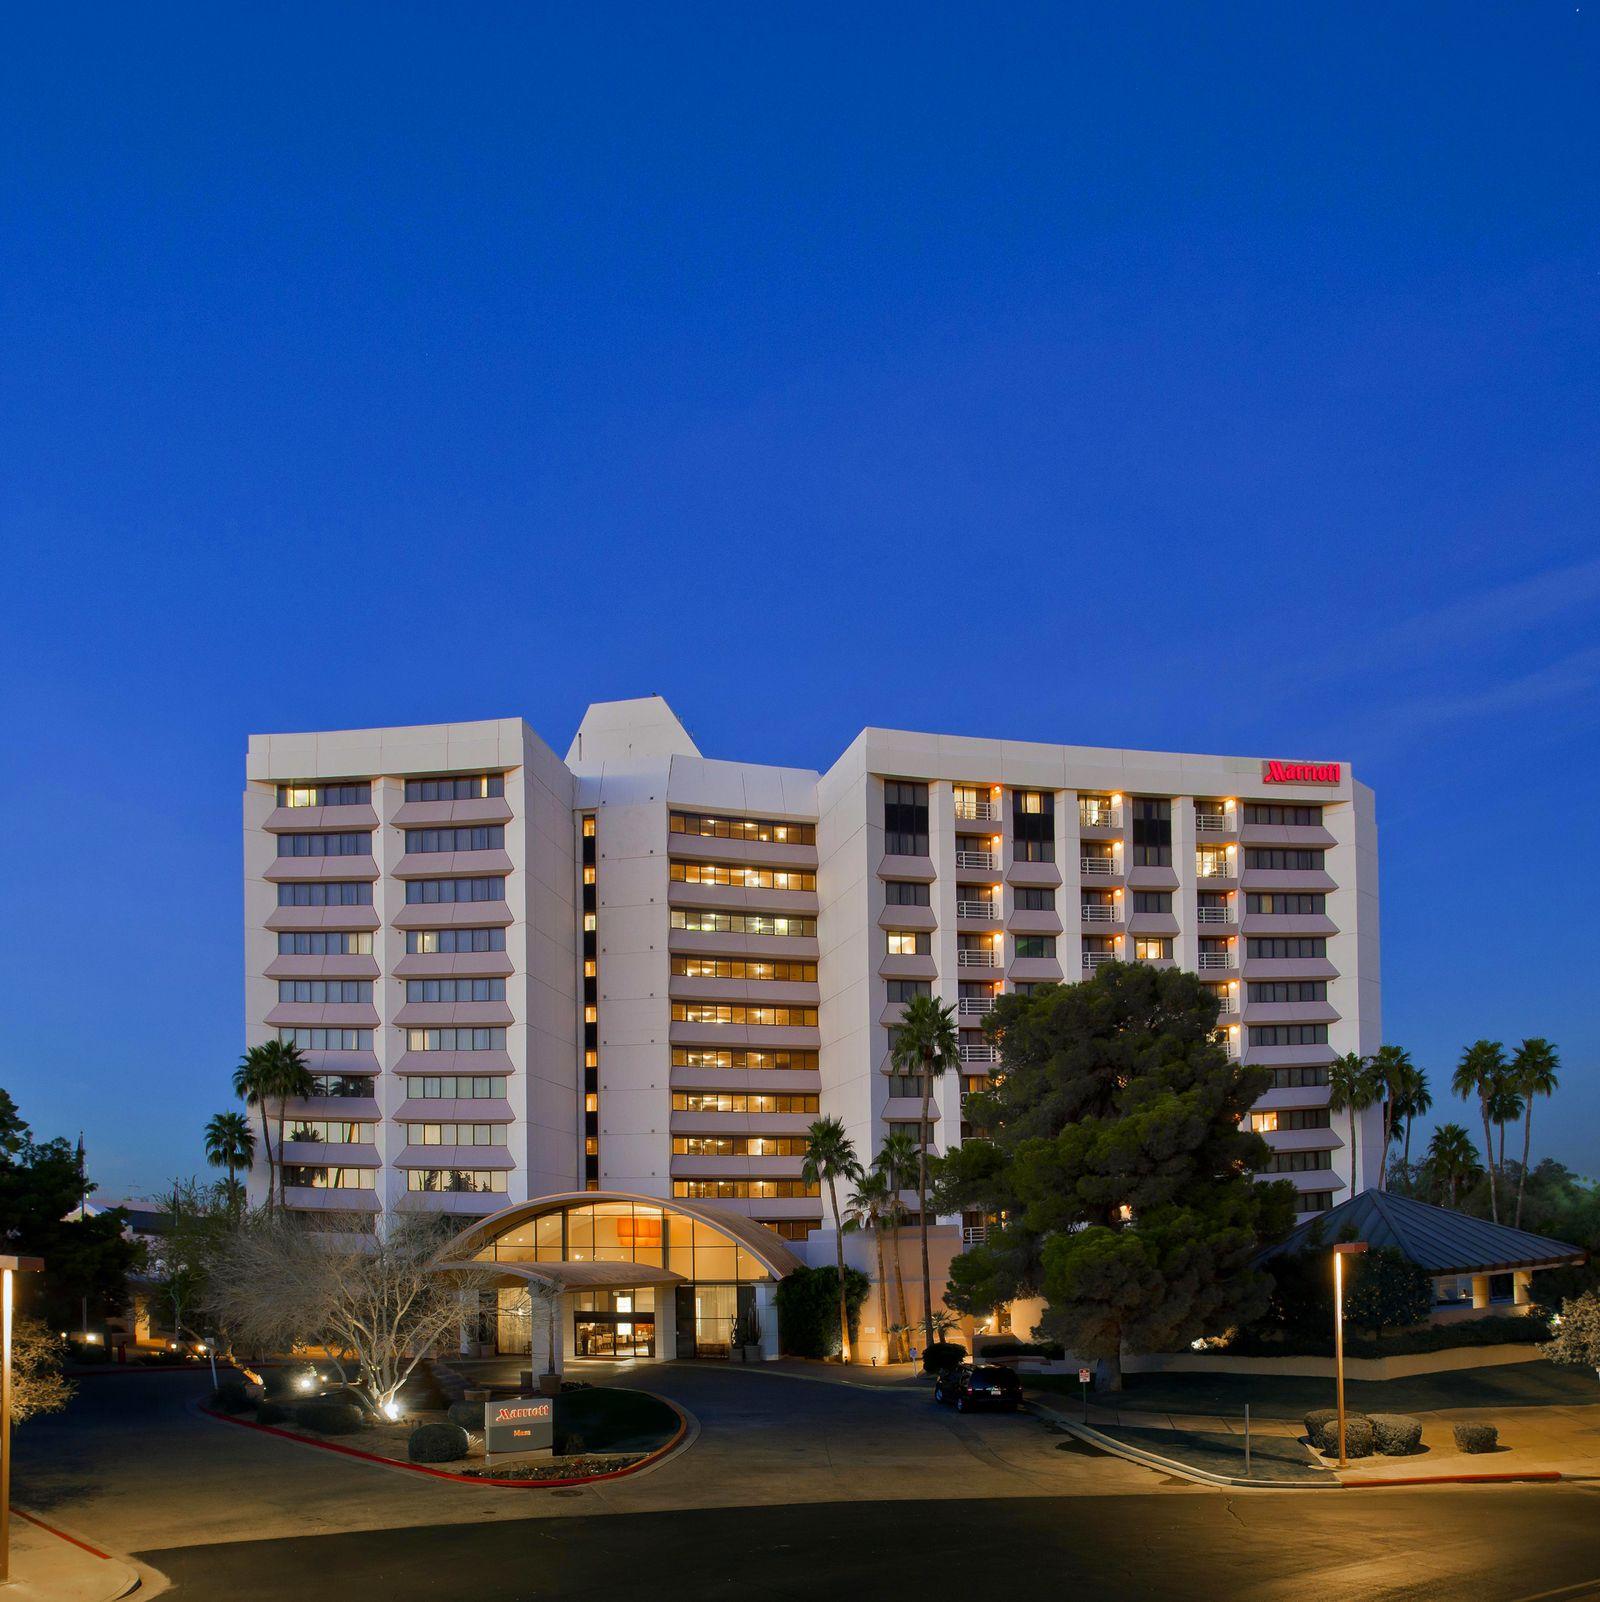 Hotels In Glenwood Ca